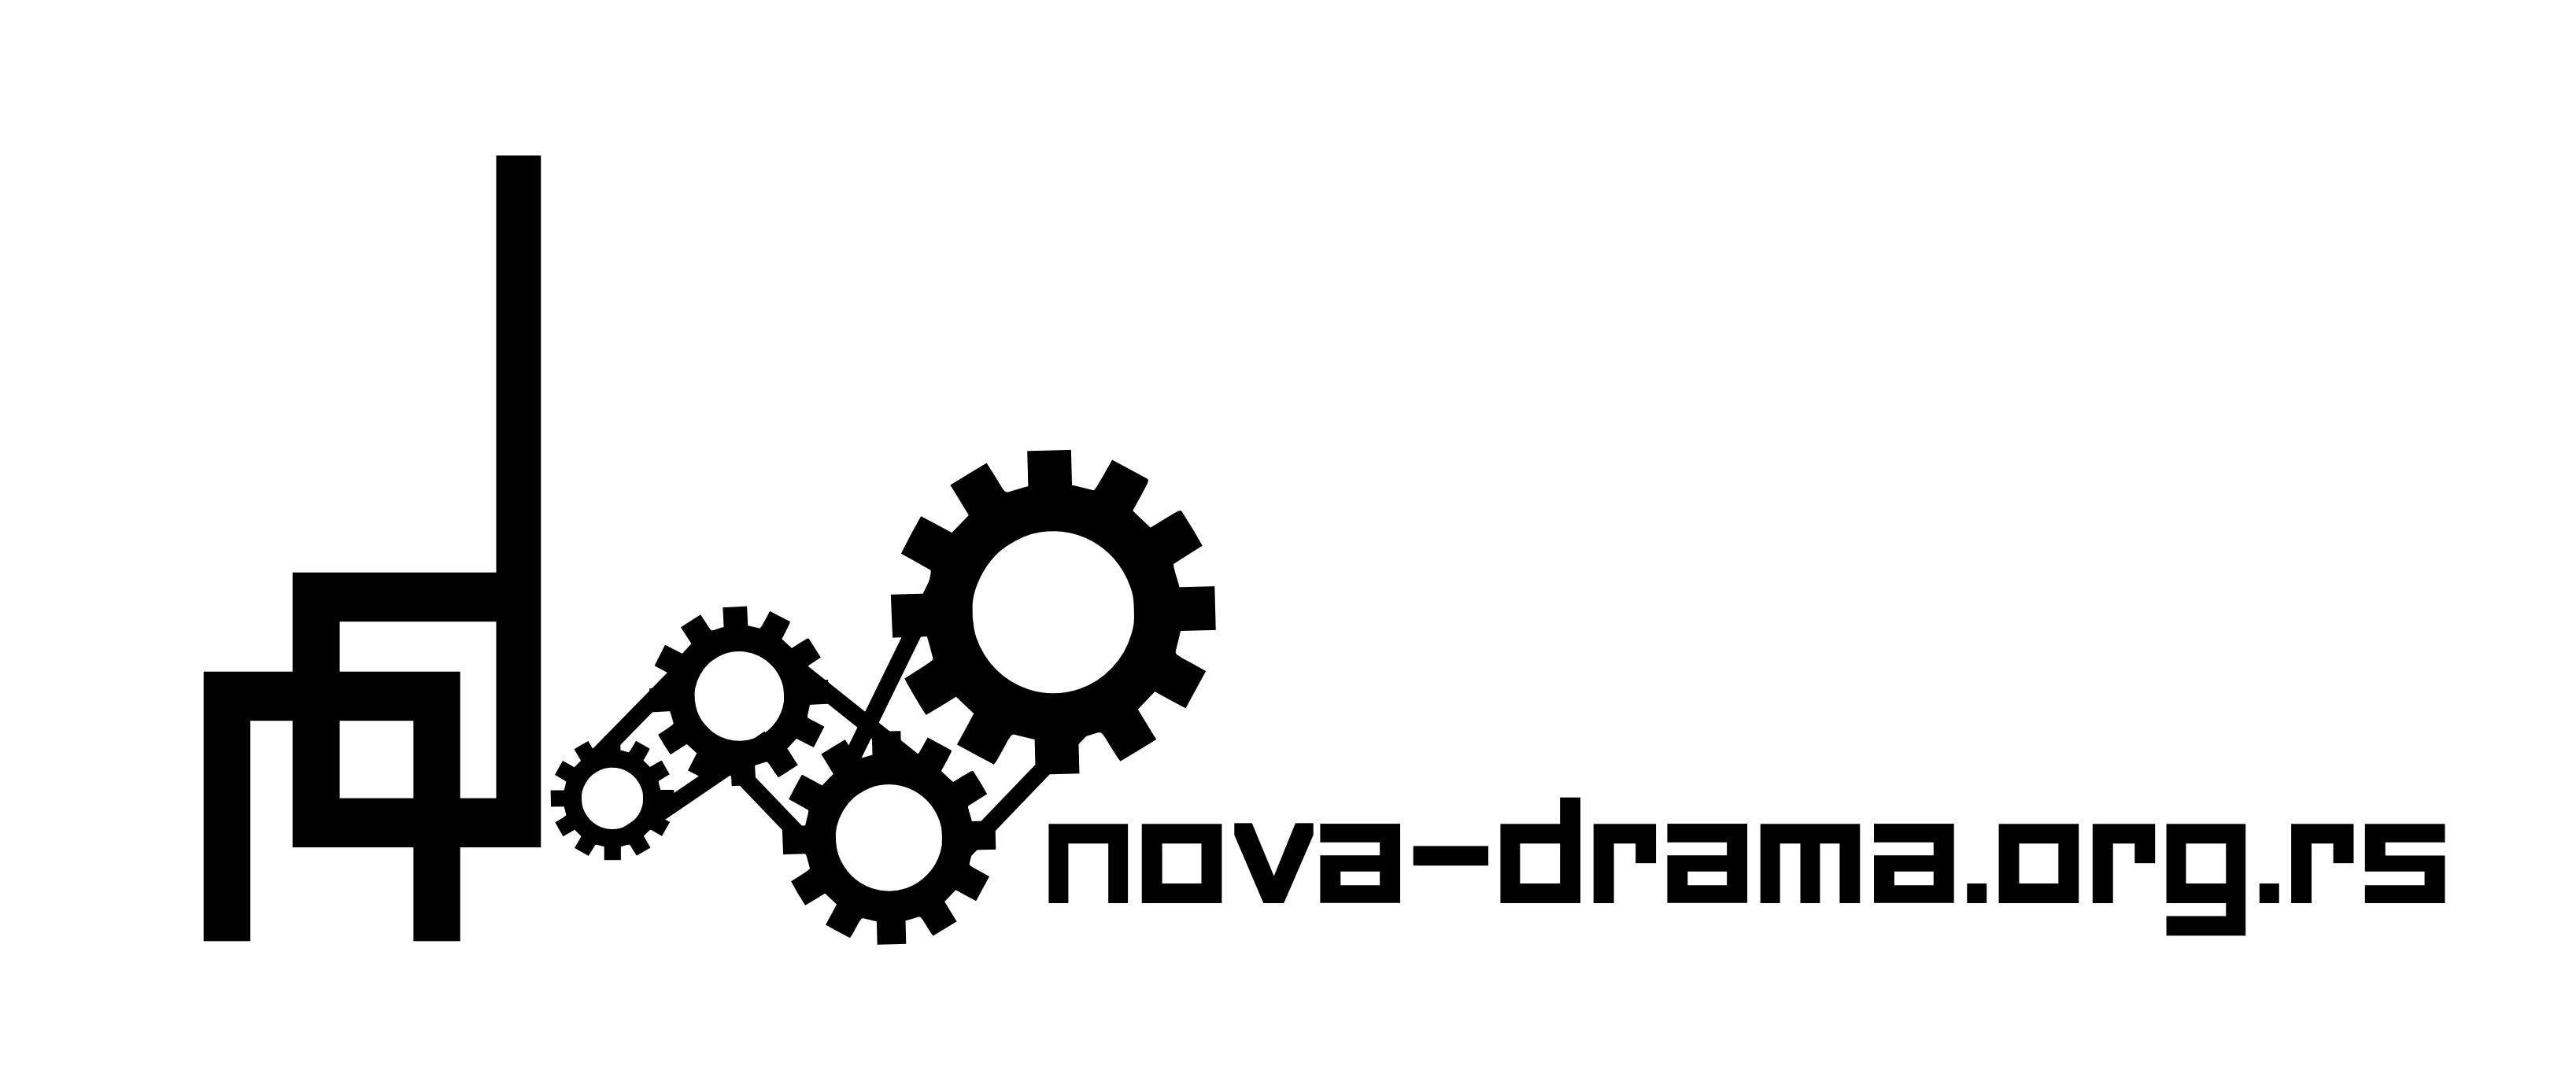 Arhiva nove drame